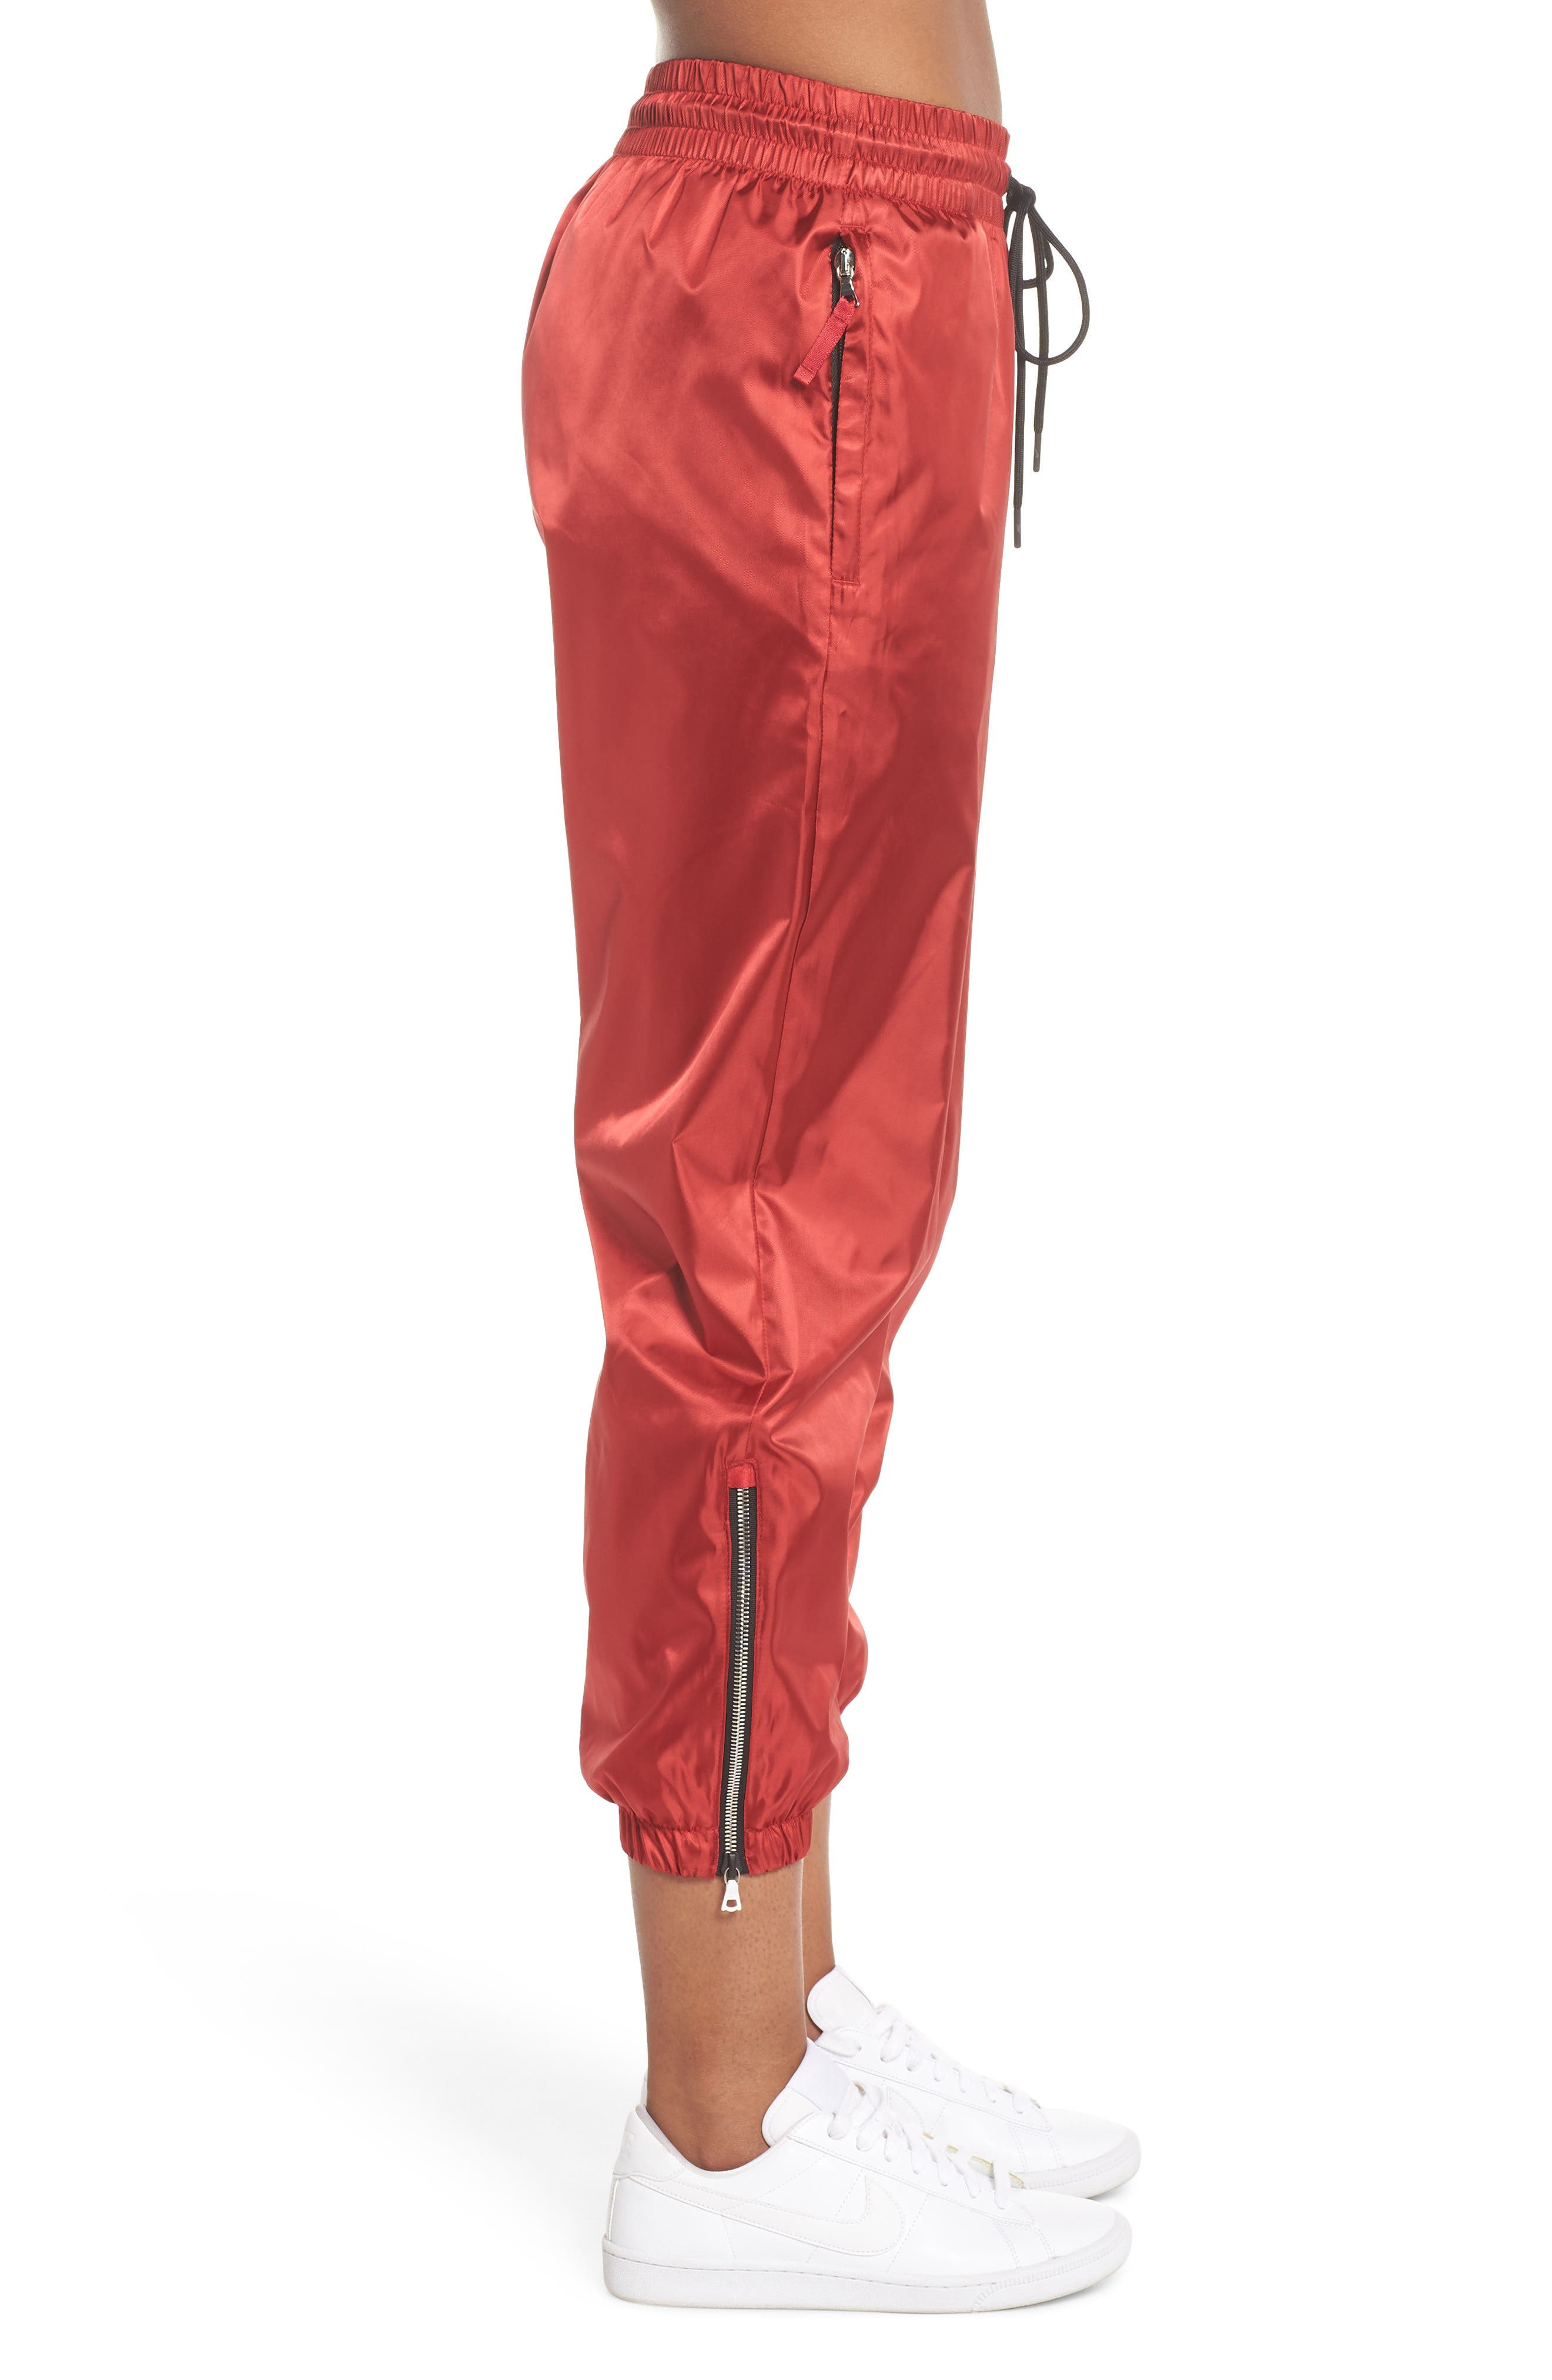 NikeLab Collection Women's Satin Track Pants,                             Alternate thumbnail 3, color,                             600